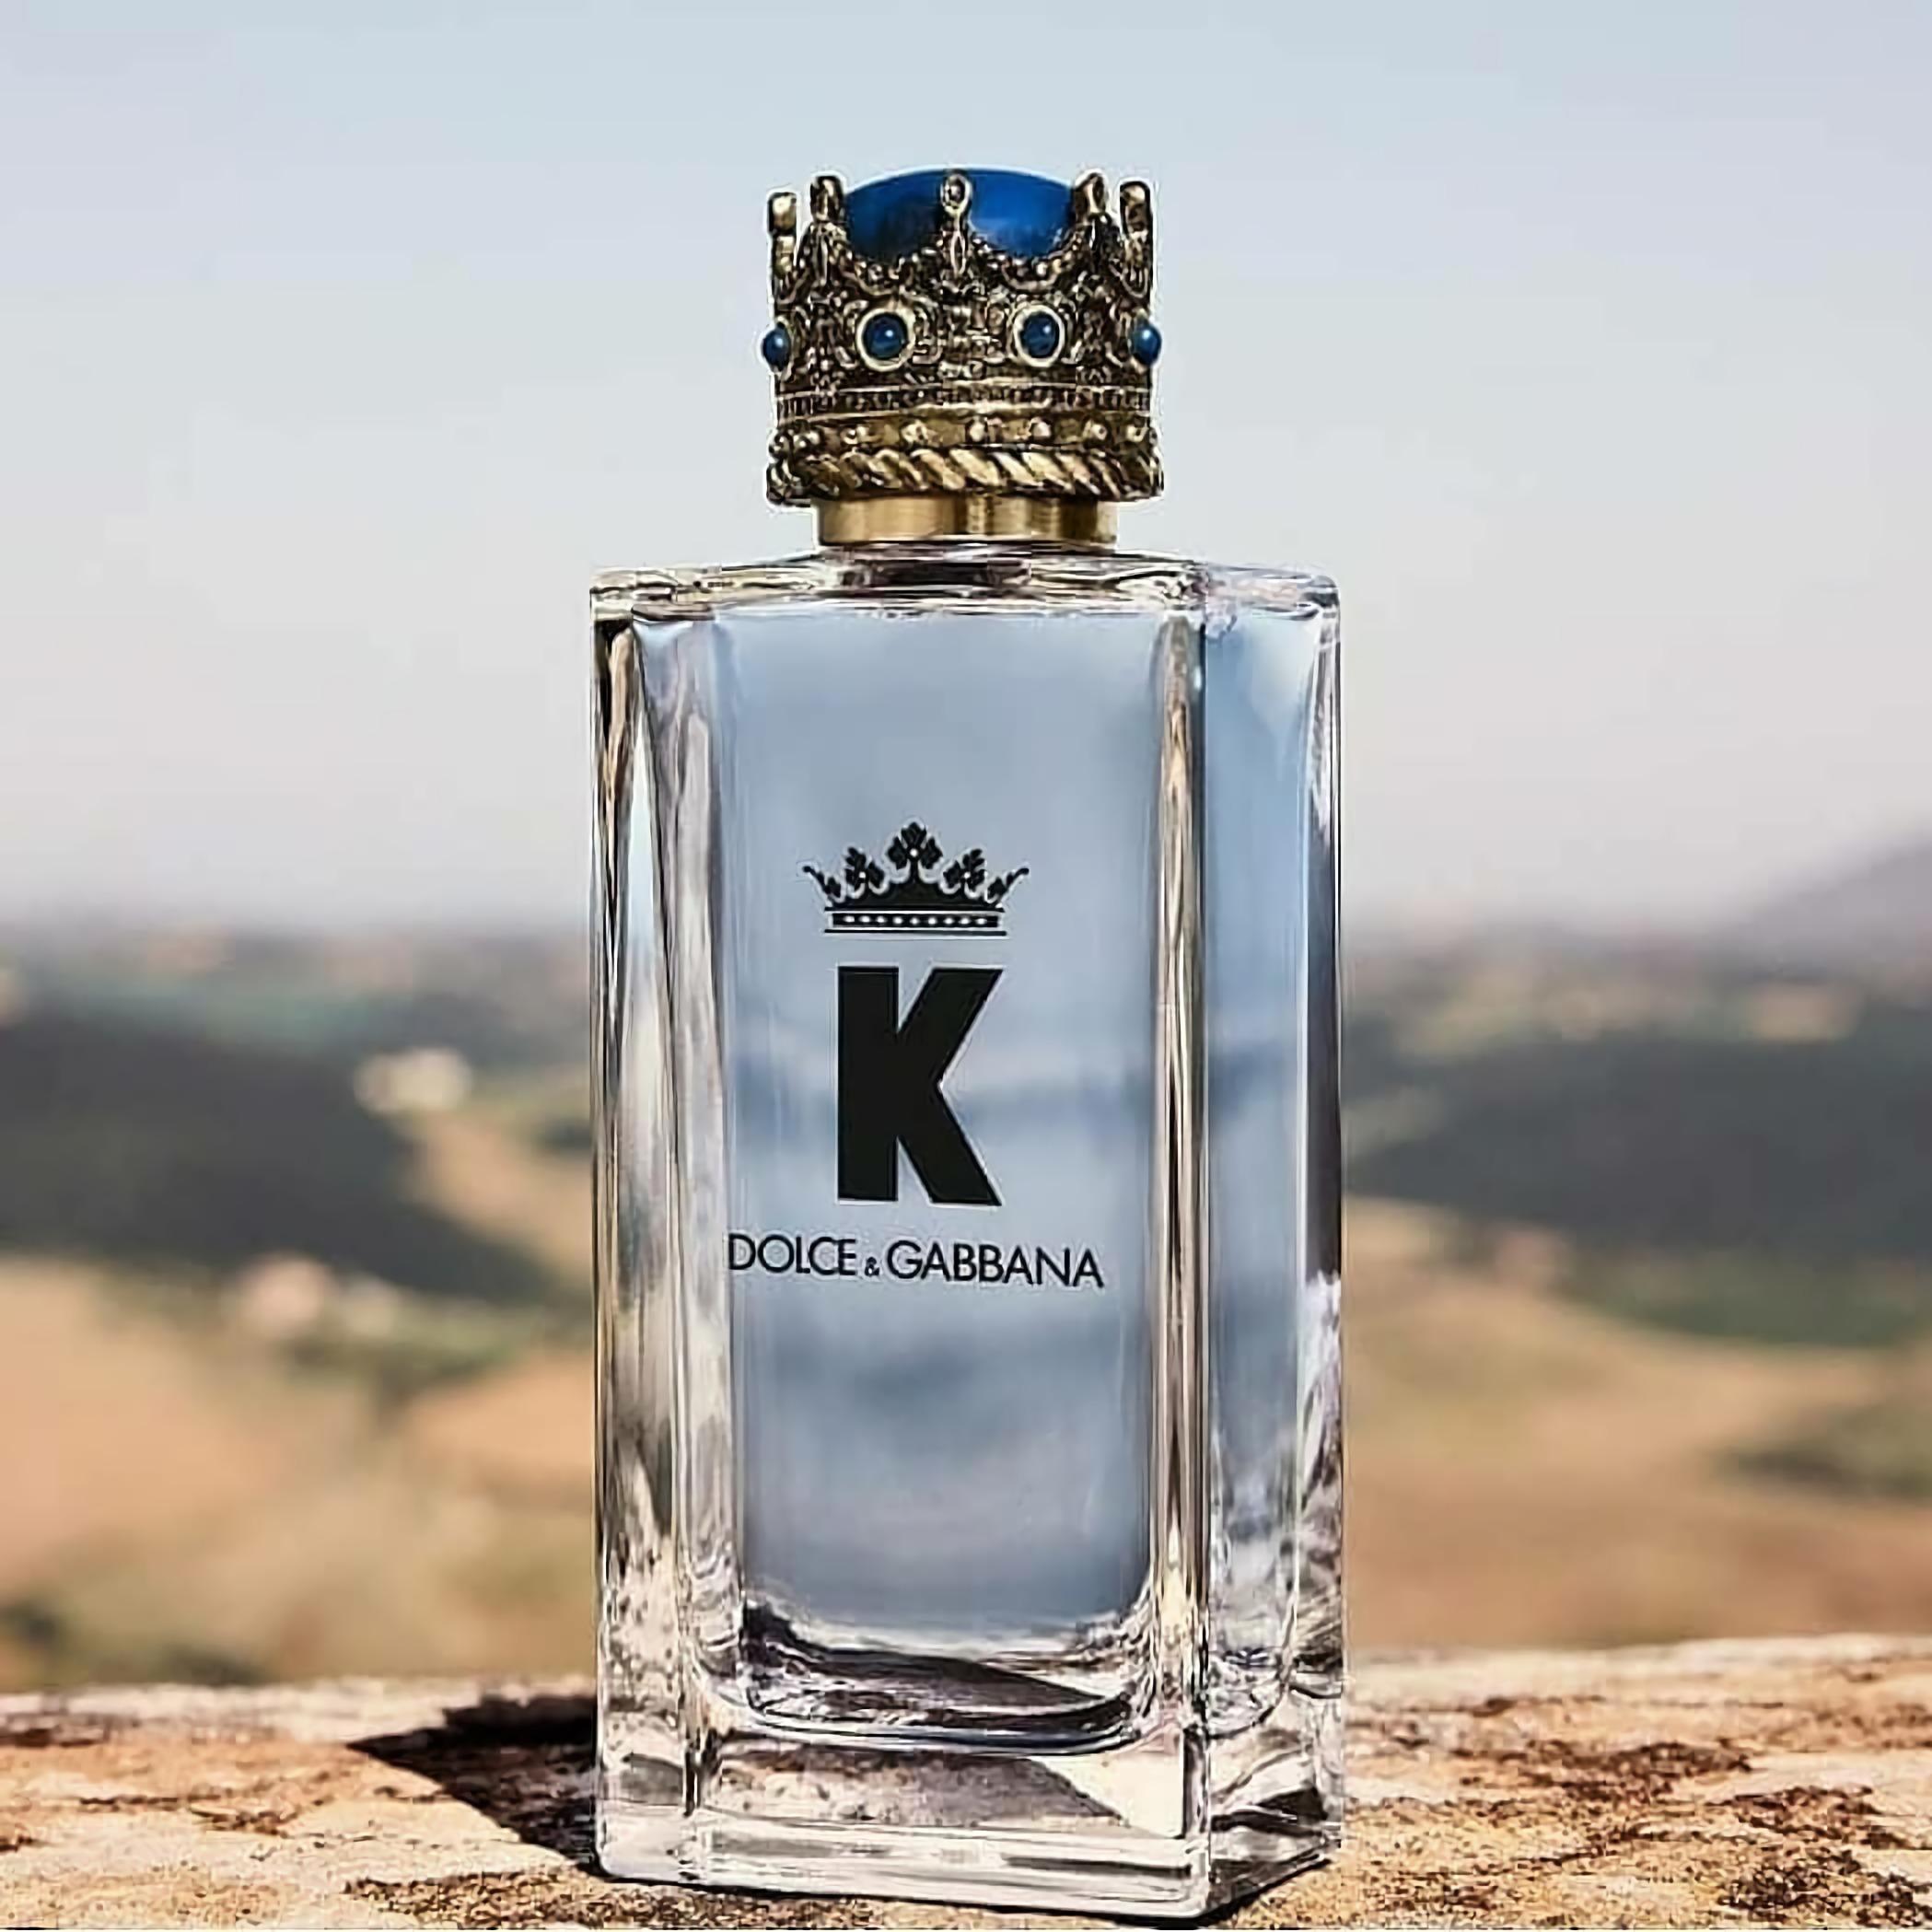 парфюмерная вода с легким запахом Dolce & Gabbana K